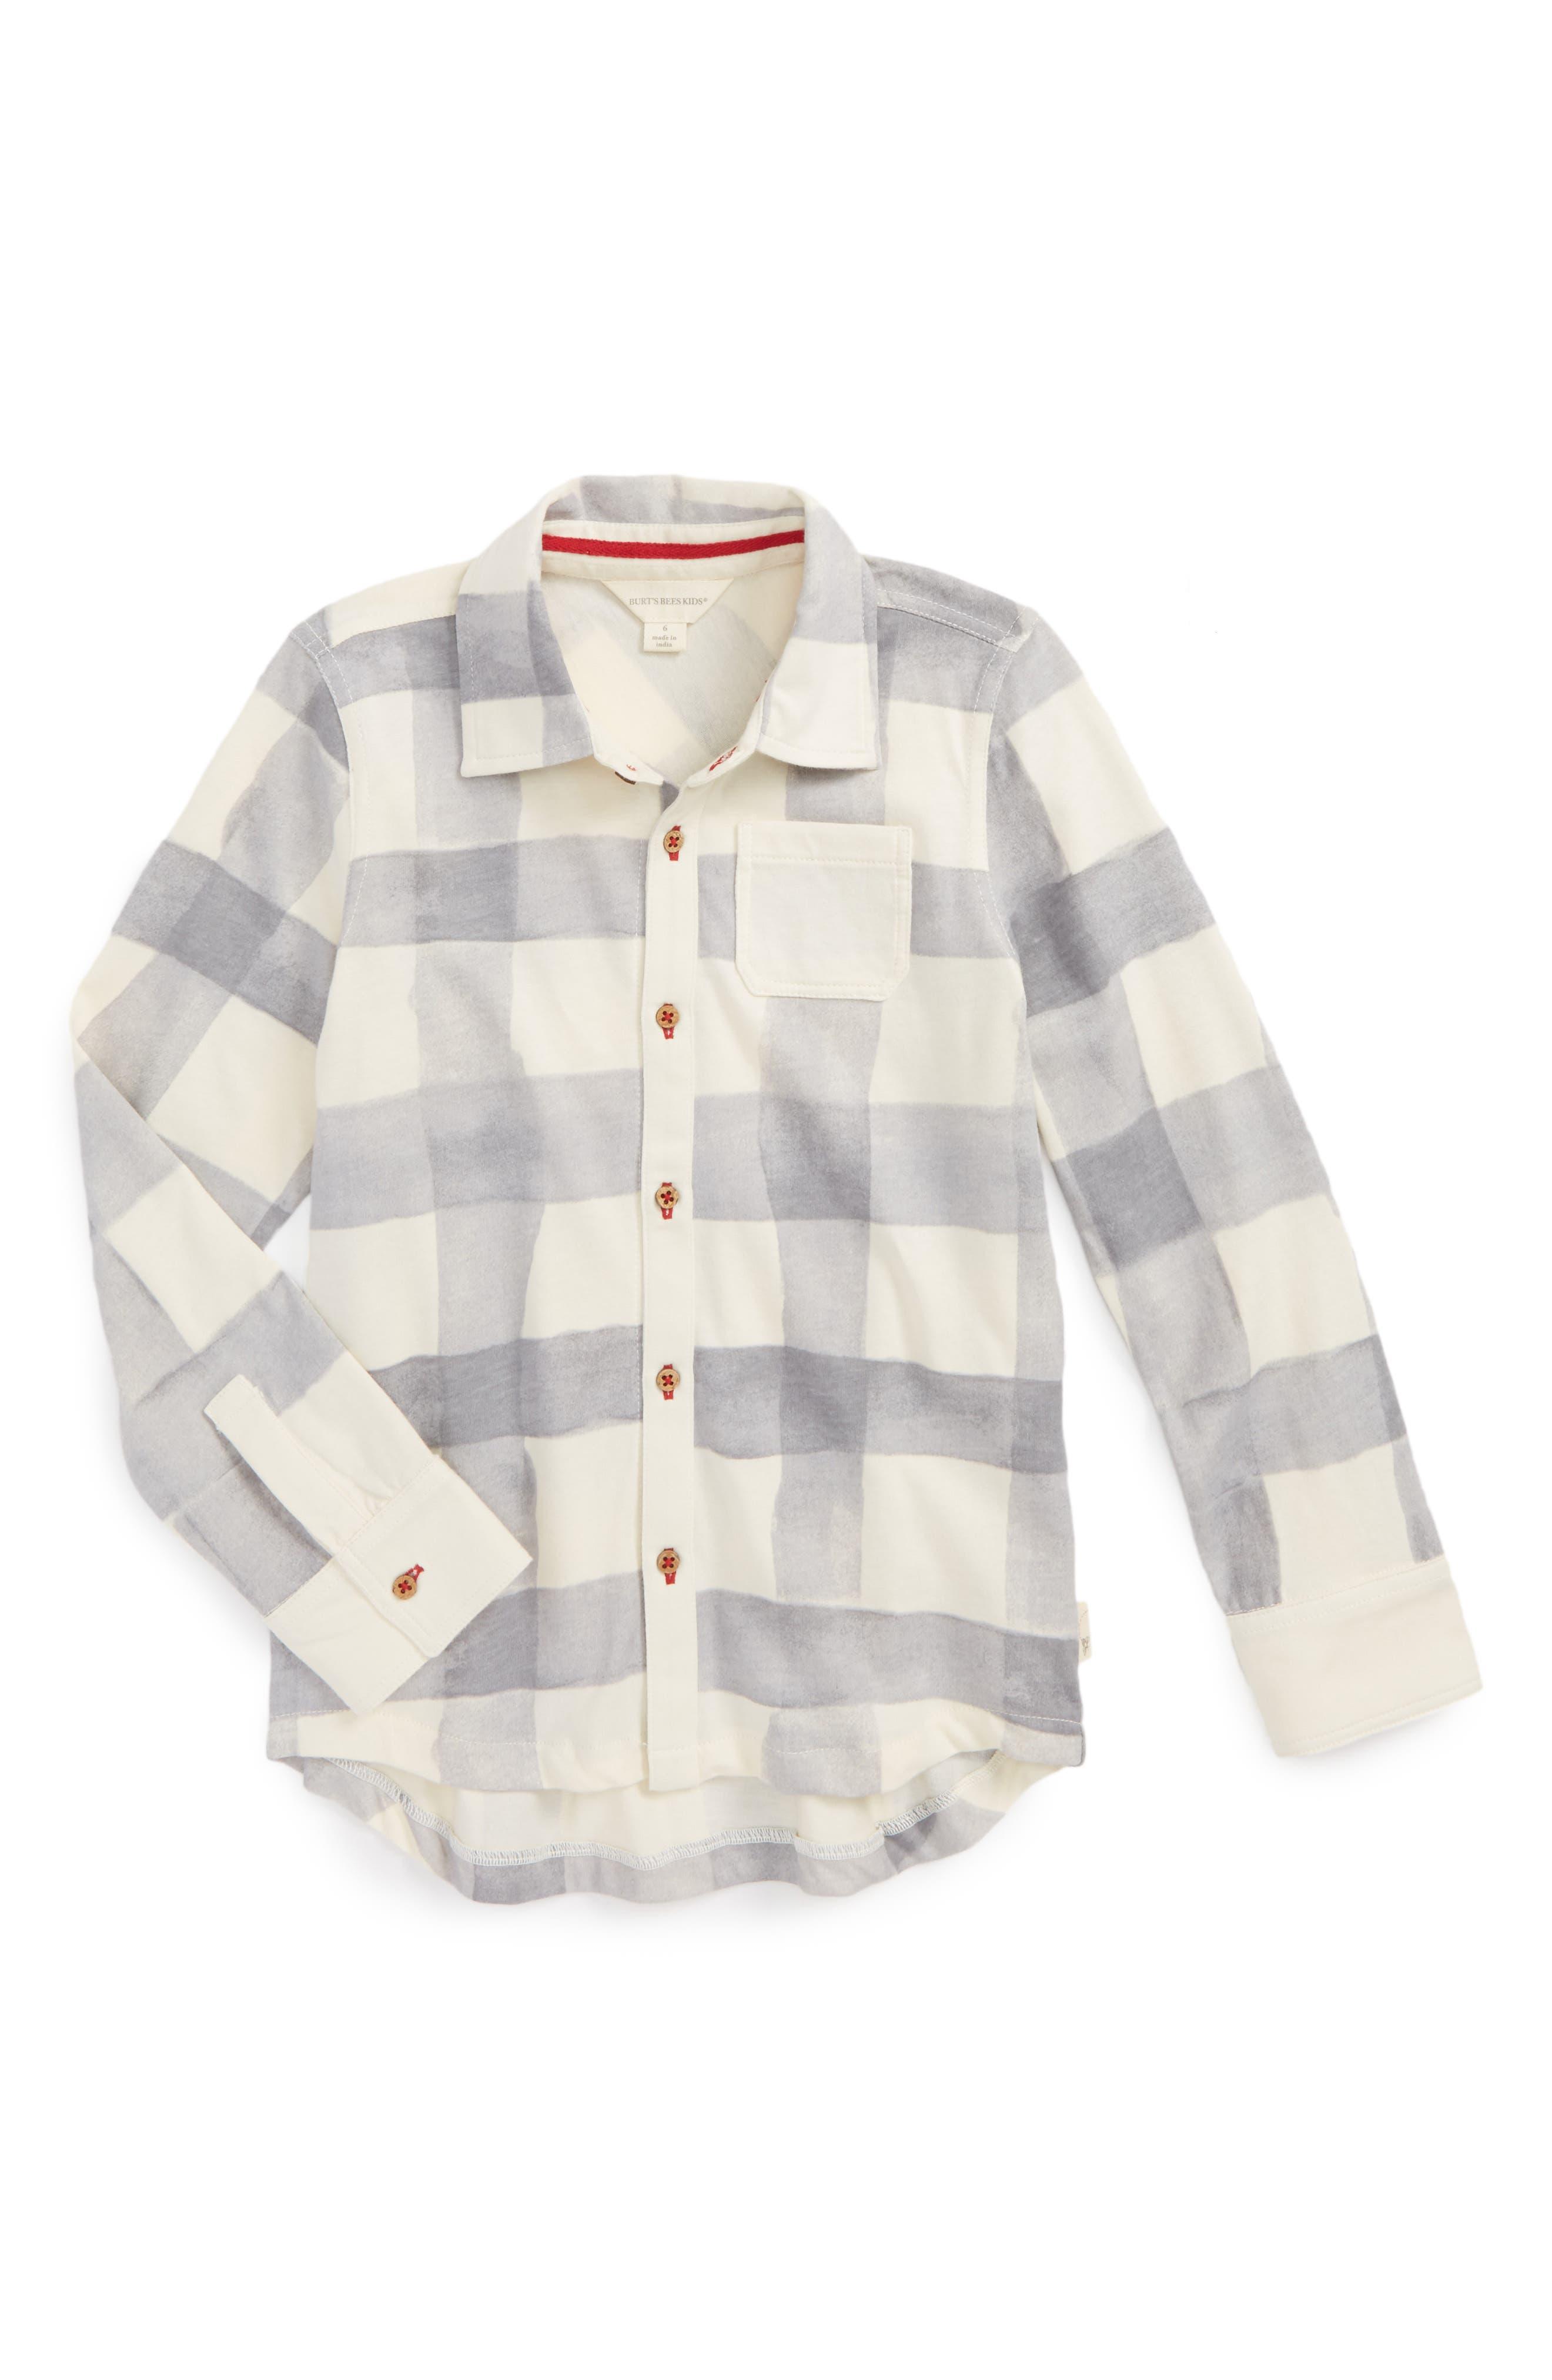 Burt's Bees Baby Watercolor Check Organic Cotton Shirt (Toddler Boys & Little Boys)